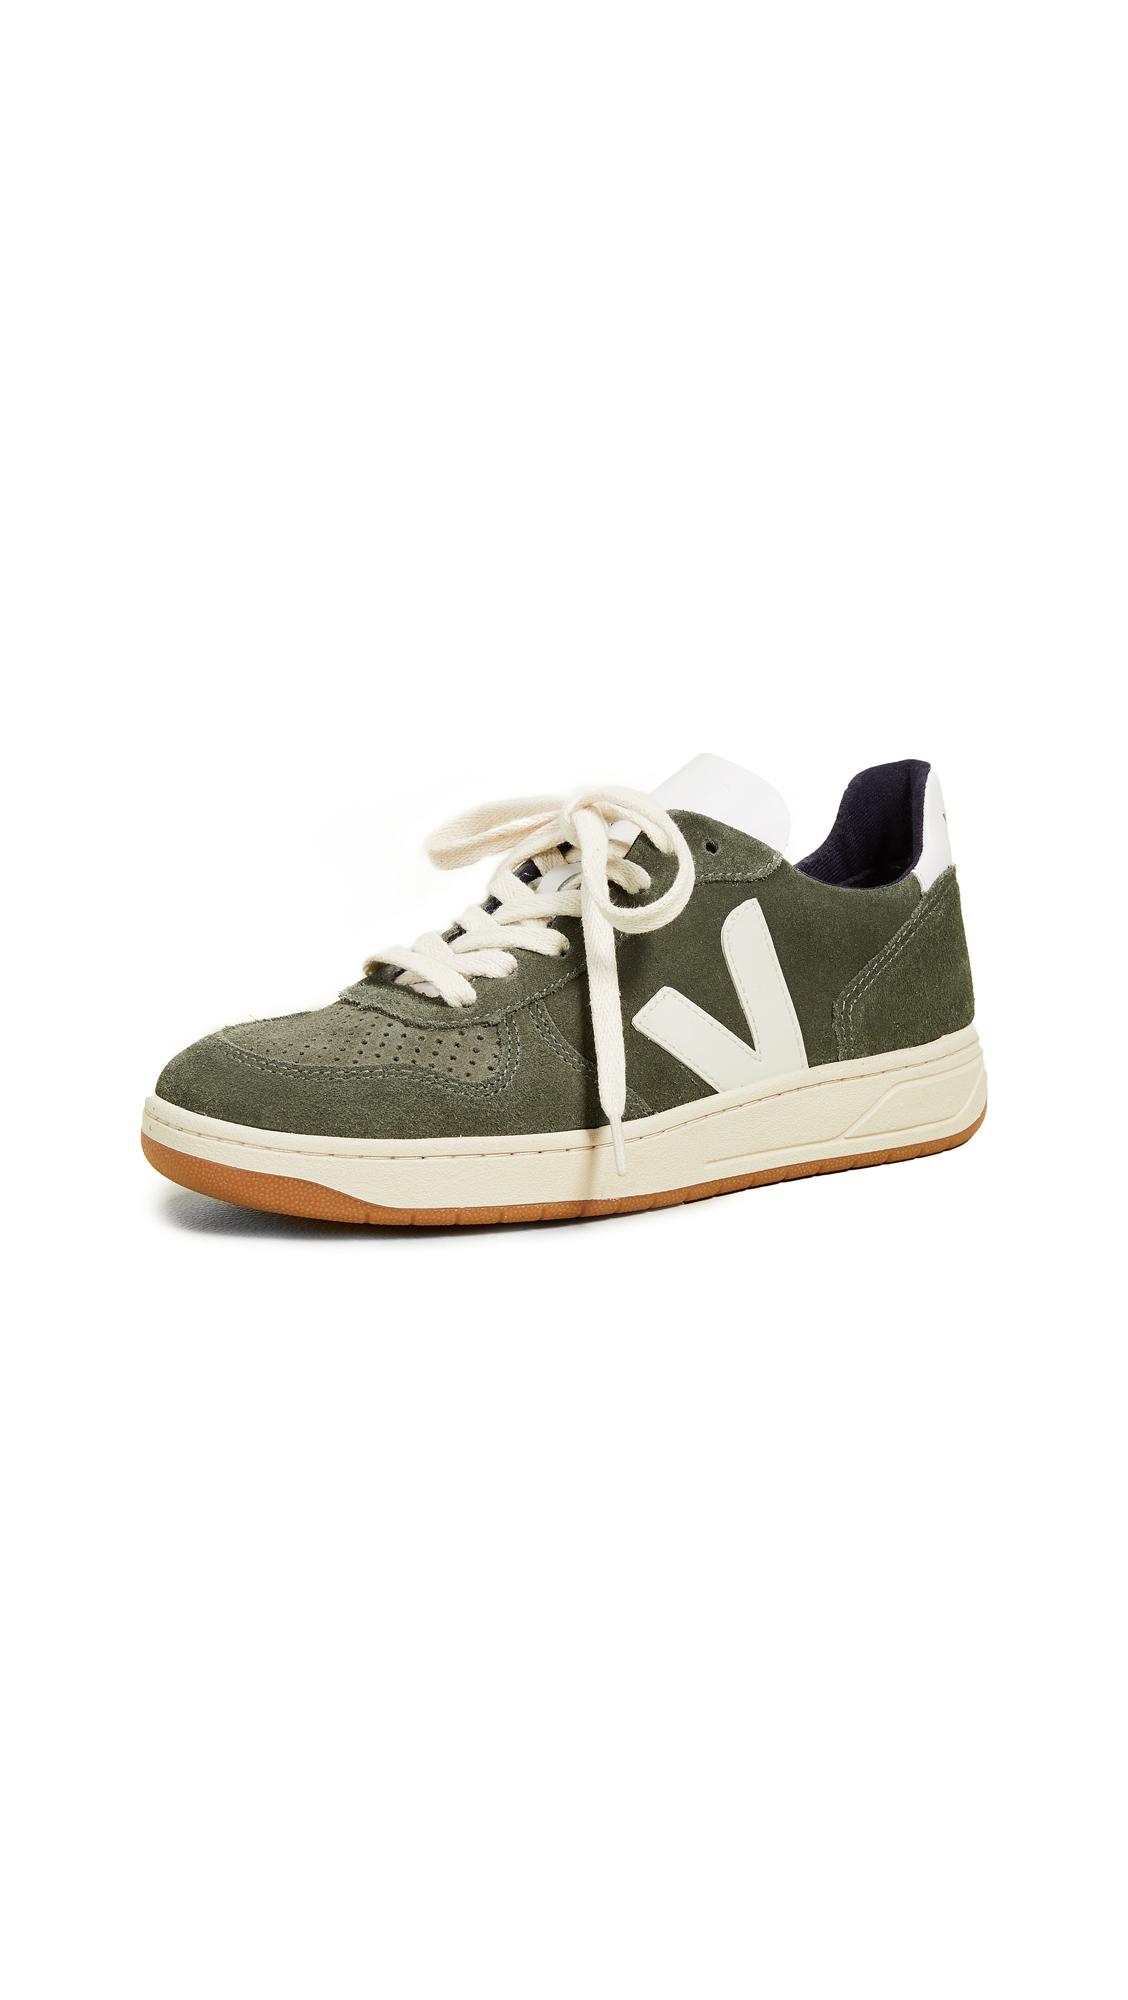 Veja V-10 Sneakers - Olive Pierre